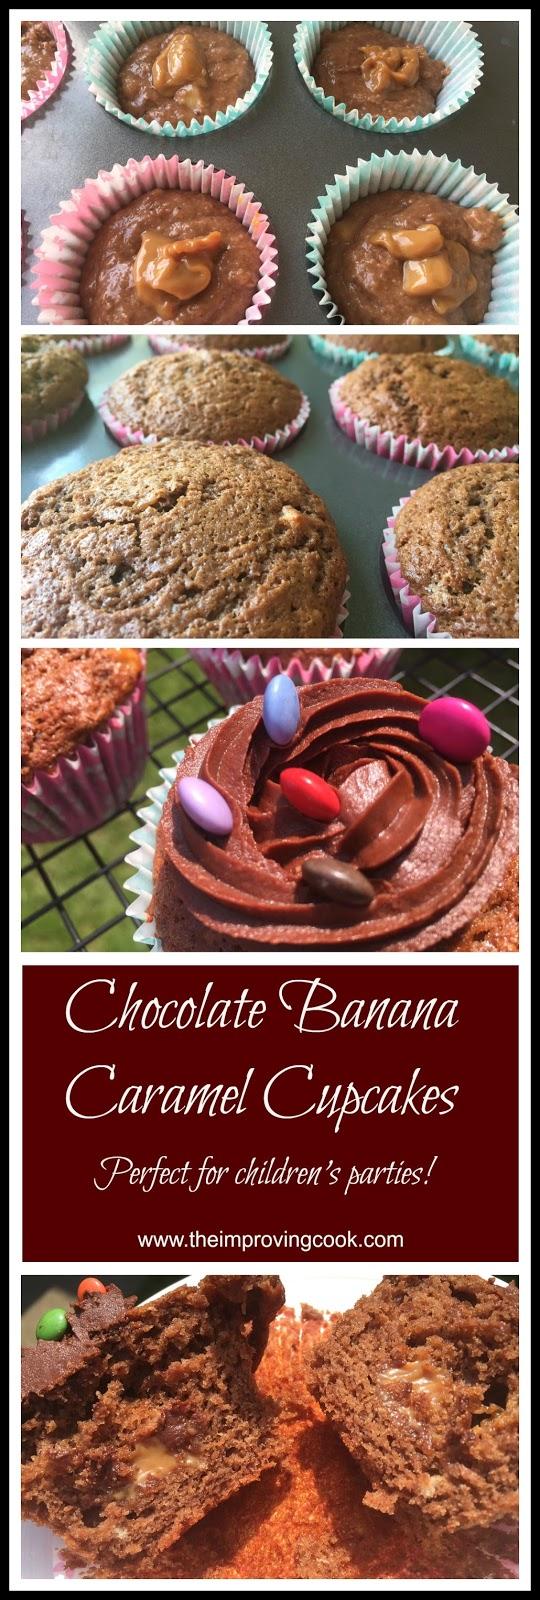 Chocolate Banana Caramel Cupcakes collage